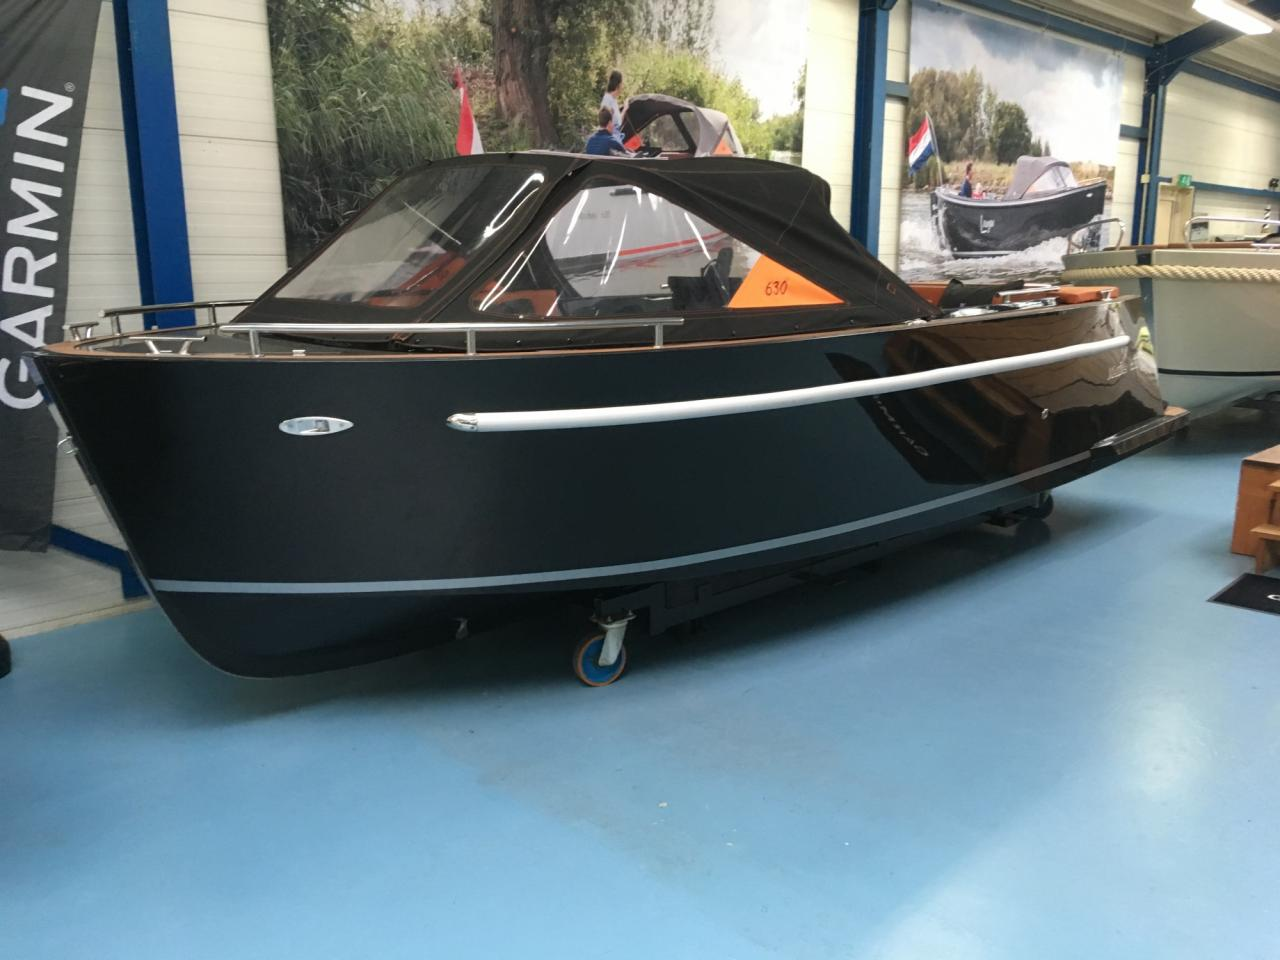 Maxima 630 zwart met Honda 60 pk in unieke kleurstelling! 3